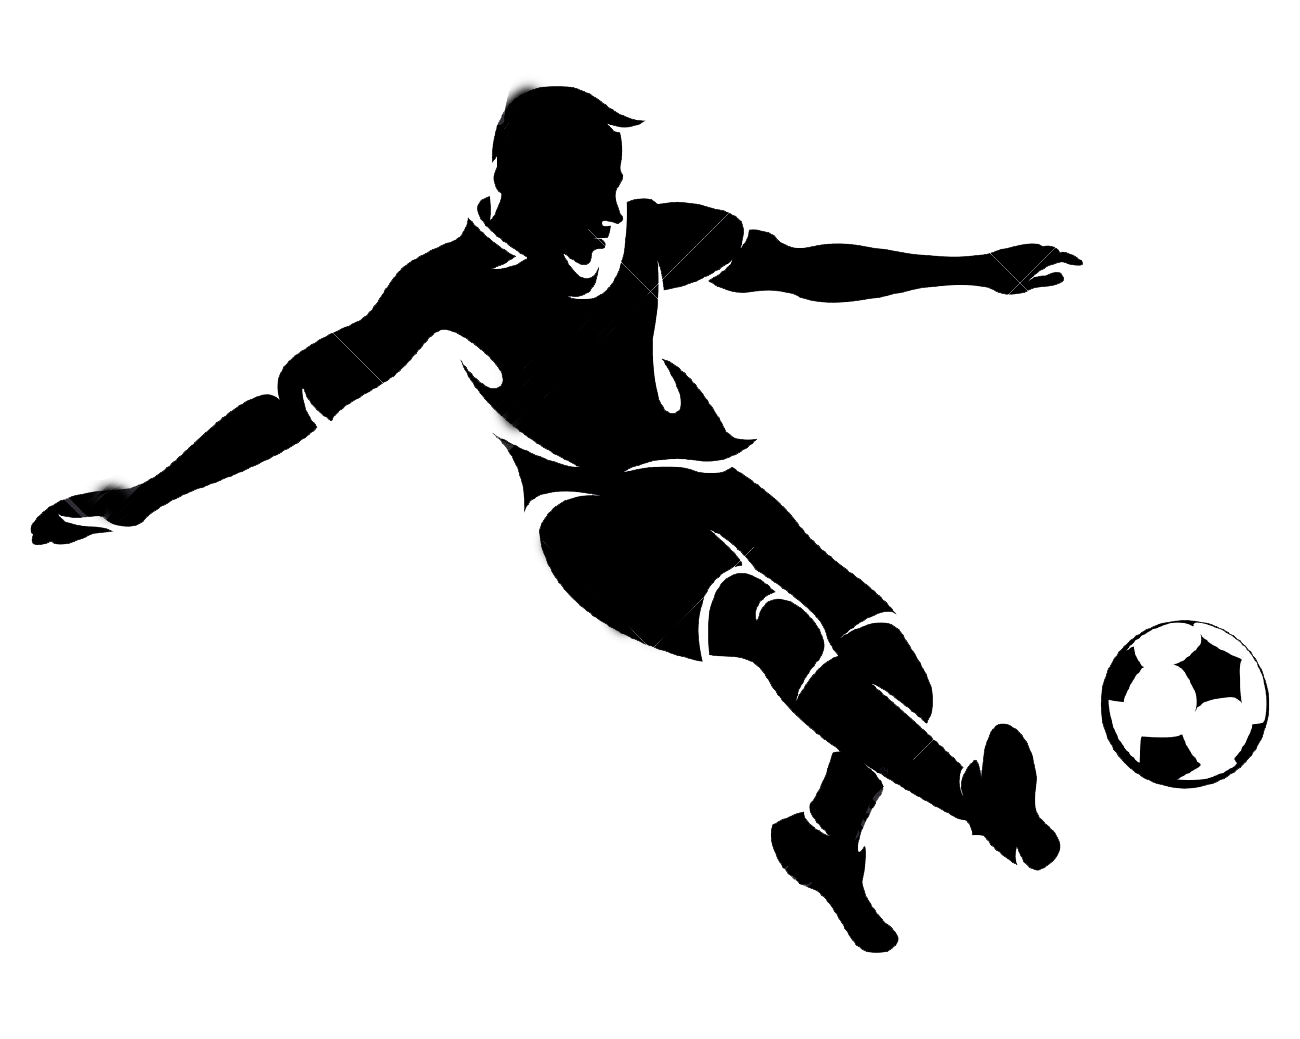 Resultado de imagen de football player logo png